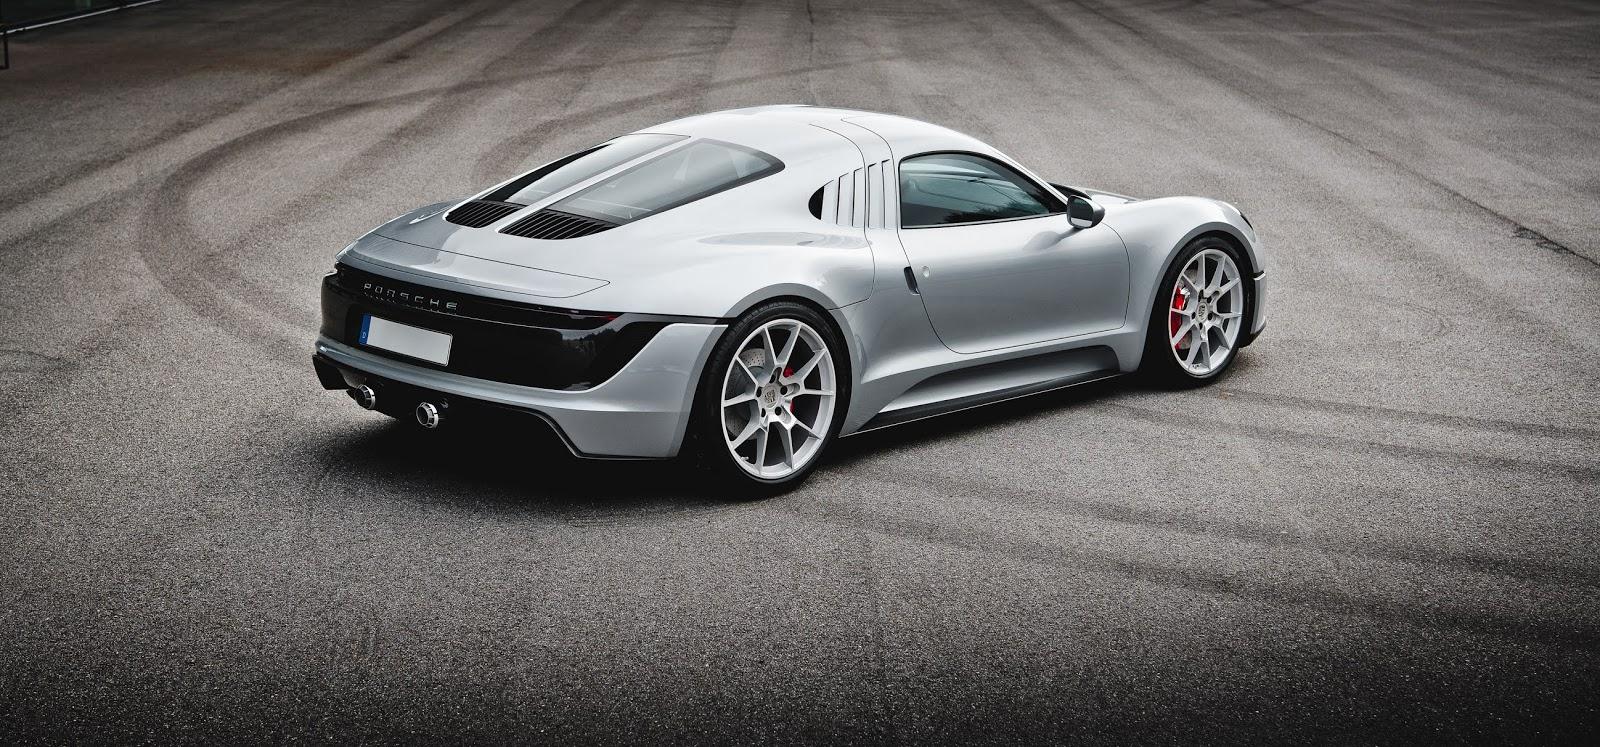 CUR7944 Le Mans Living Legend : Το πρωτότυπο που γέννησε την 718 Cayman GT4 LE MANS, Porsche, Porsche Le Mans, Porsche Unseen, sportscar, supercar, supercars, zblog, ειδήσεις